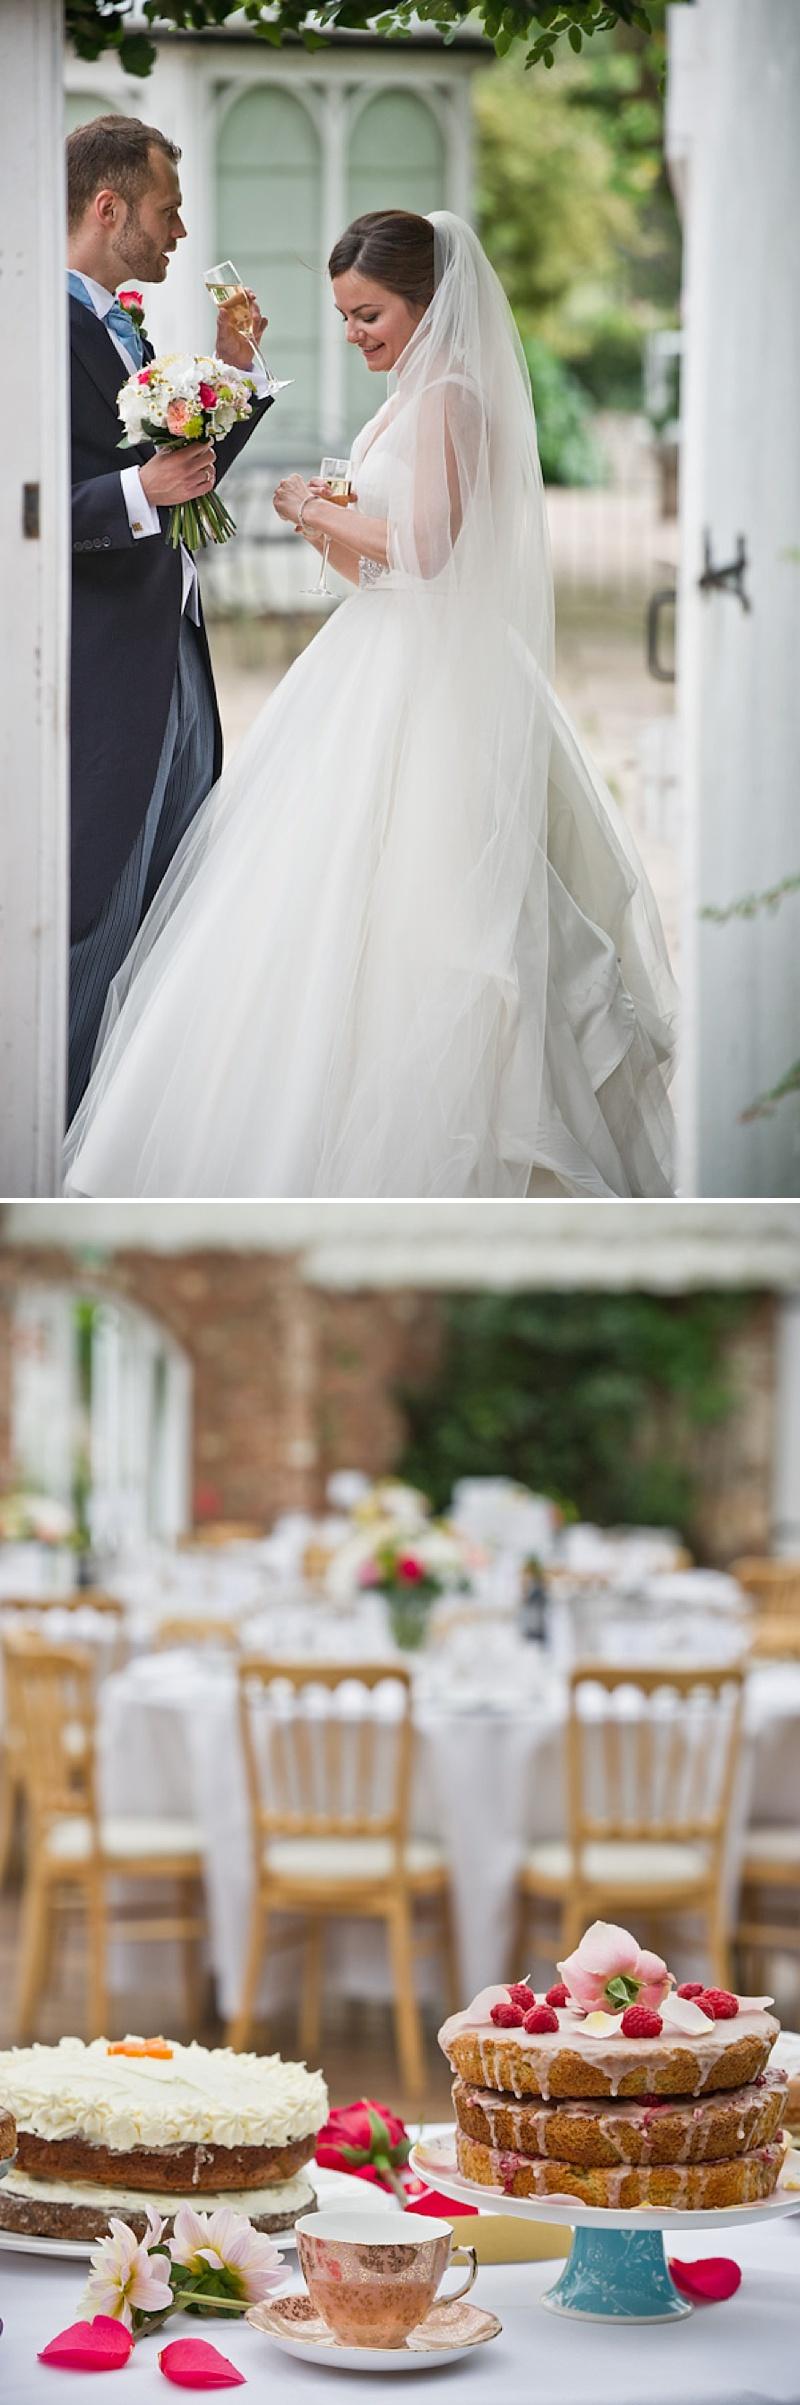 John Lewis Archives - ROCK MY WEDDING | UK WEDDING BLOG & DIRECTORY